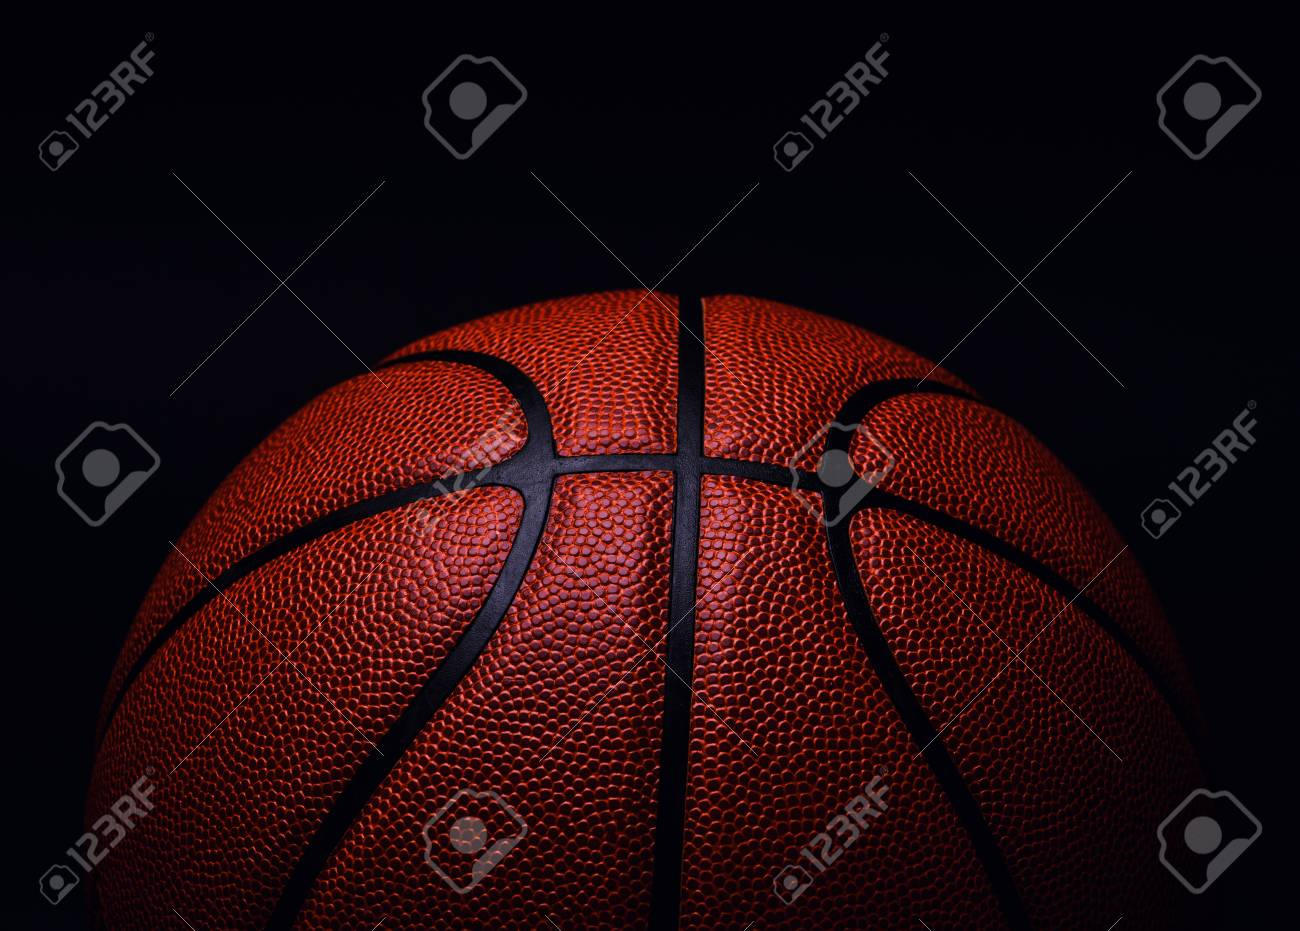 basketball ball on black background. - 121161540